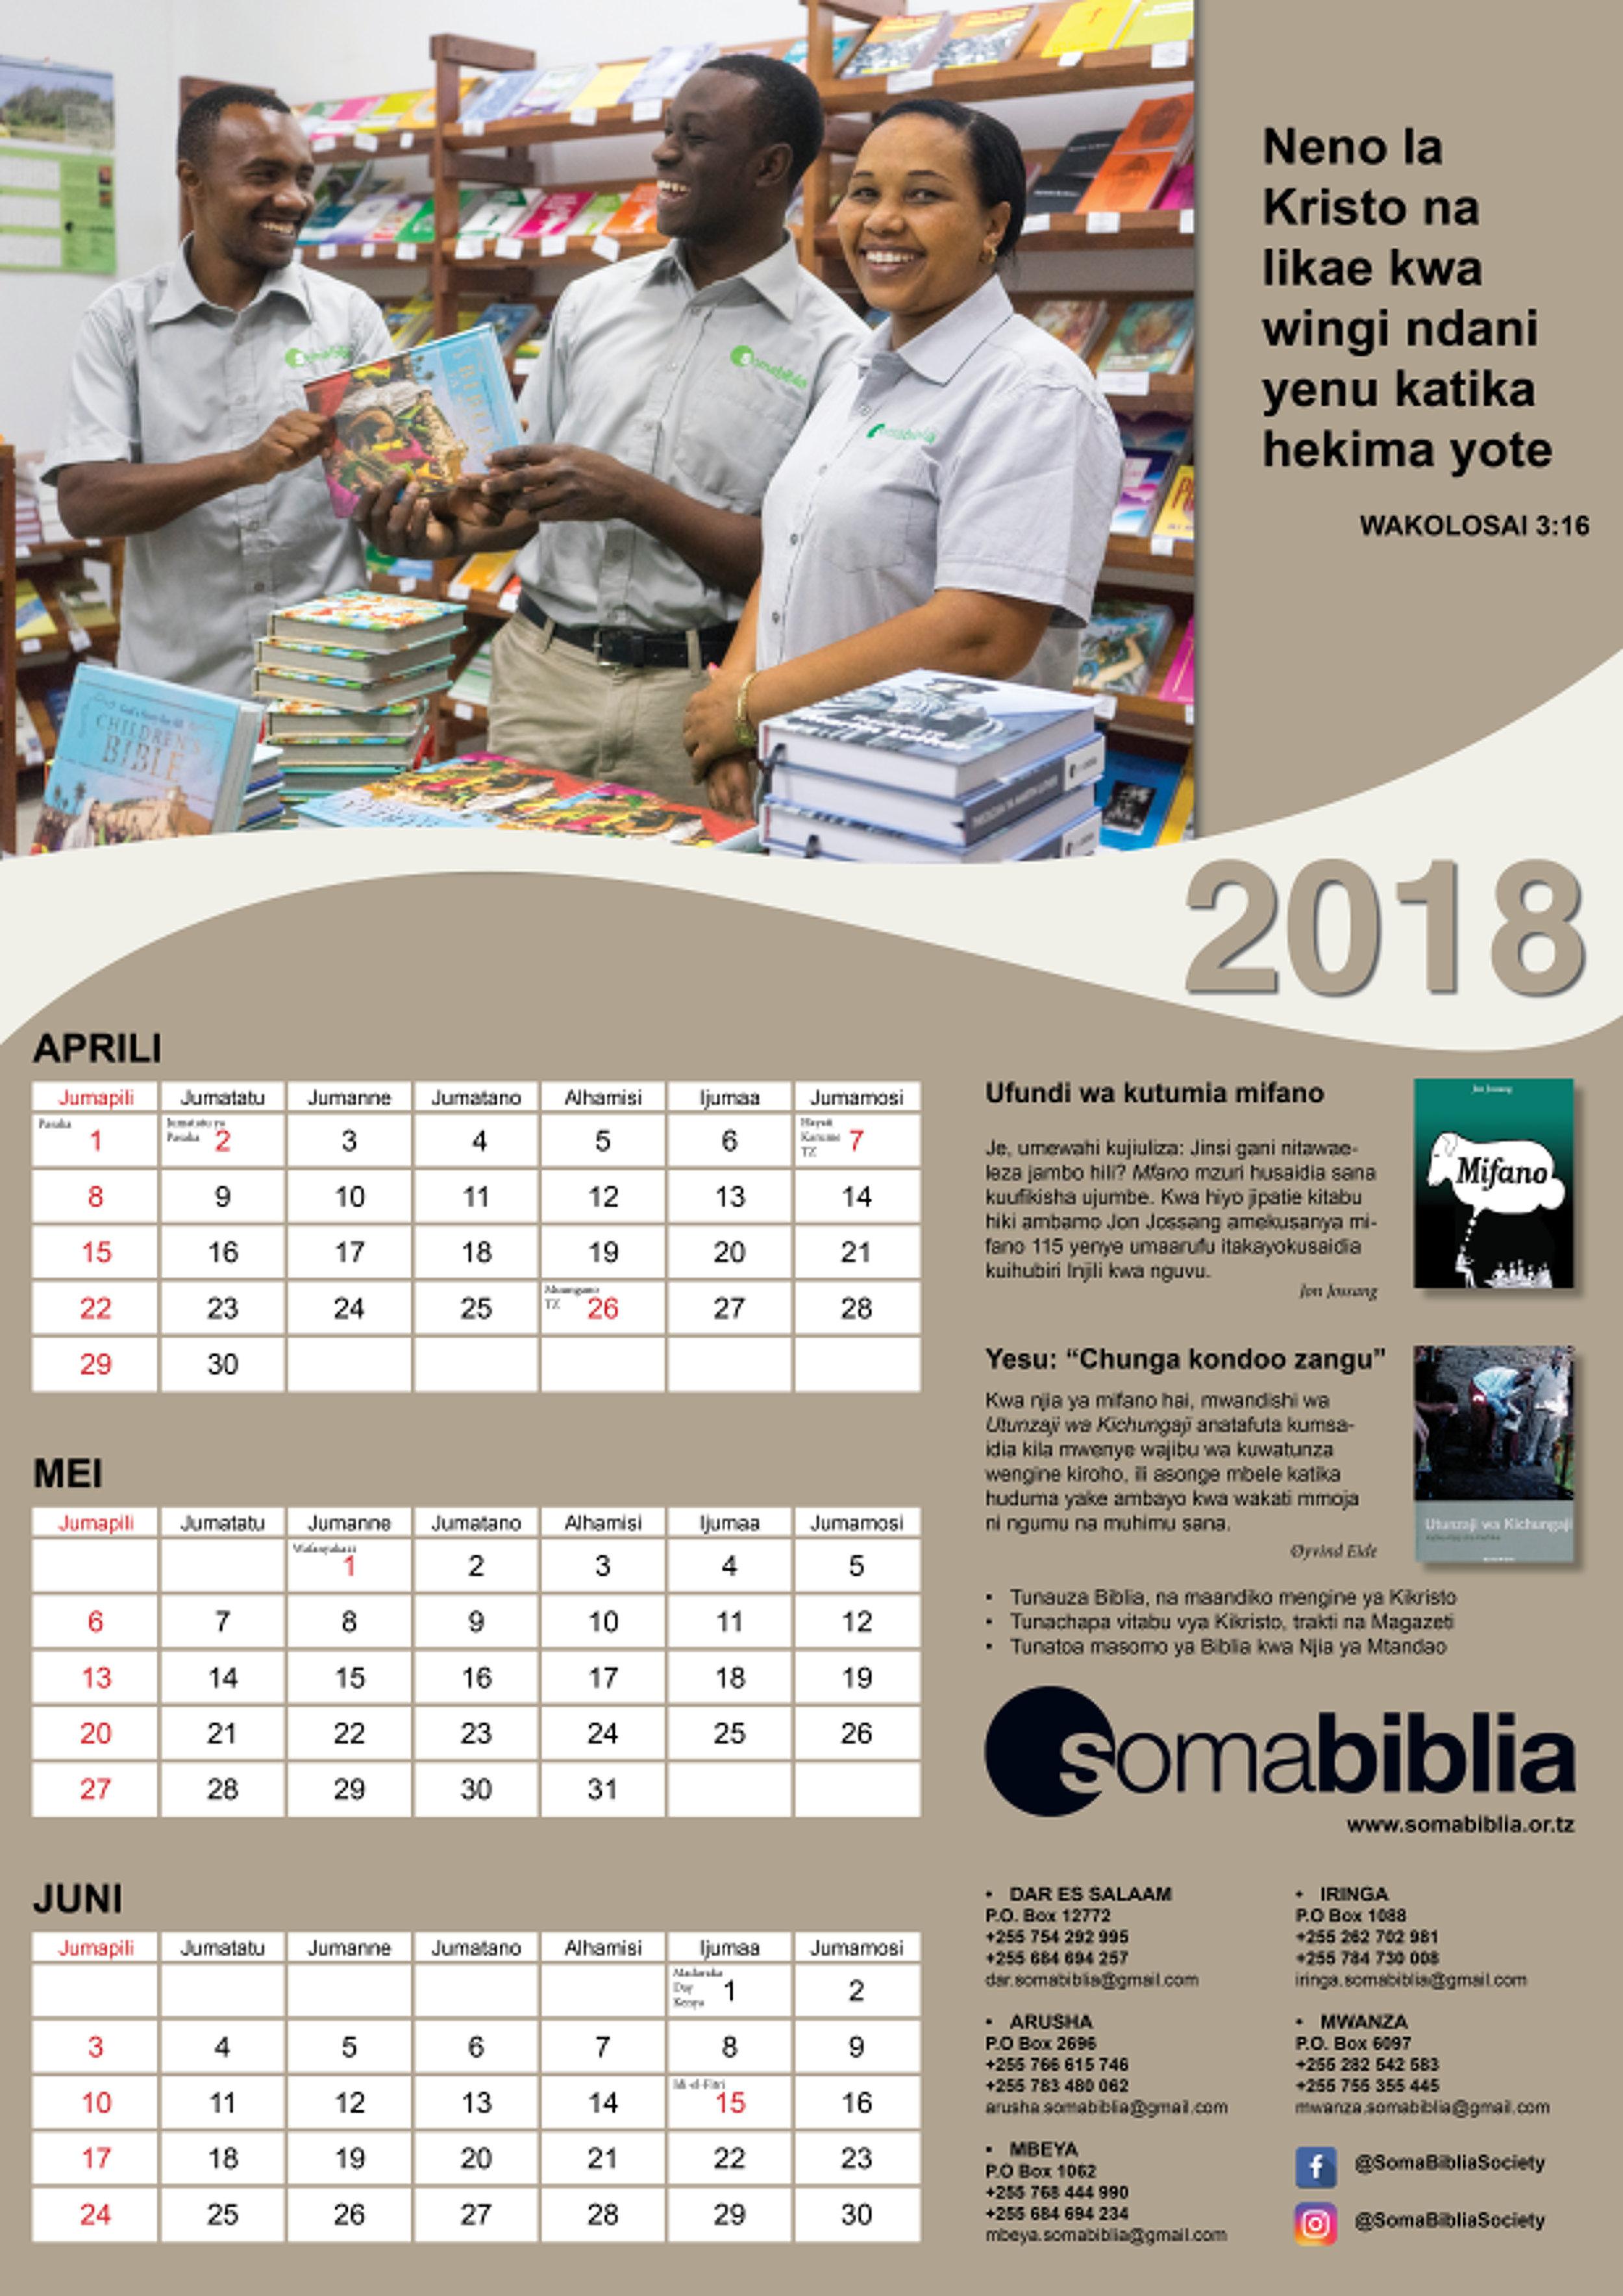 Kalenda ya ukutani 2018 final2.jpg